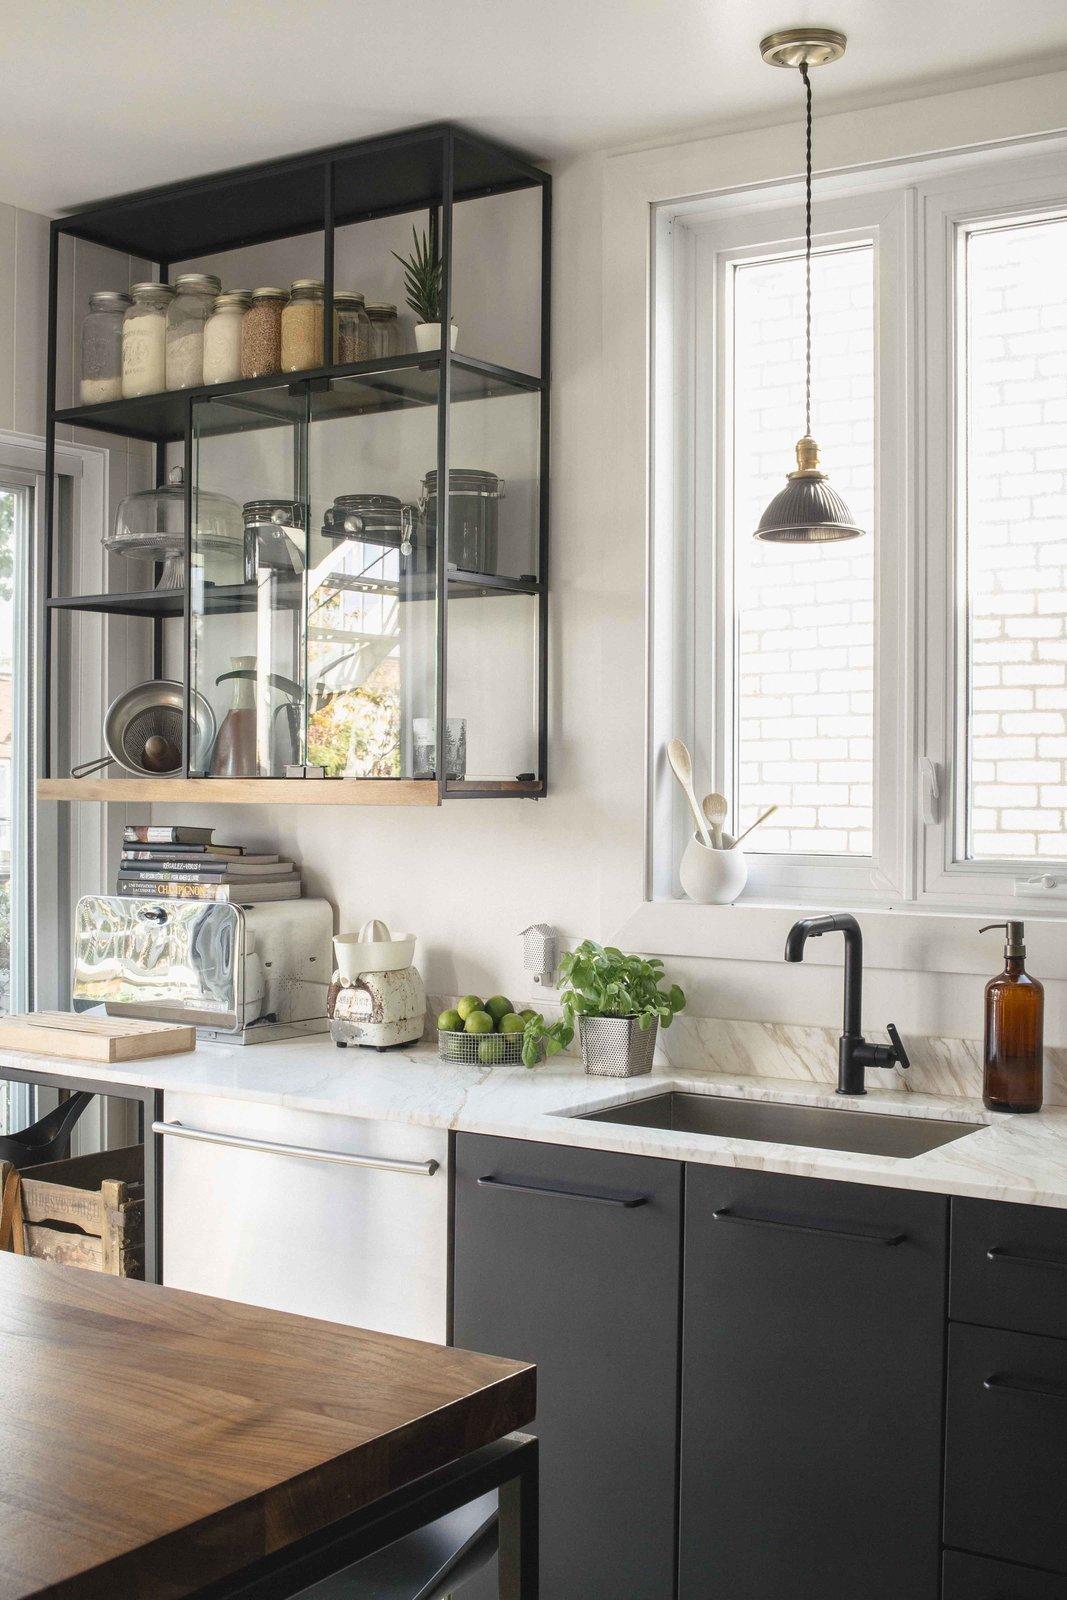 Ikea Kitchen Open Cabinet Home Decor